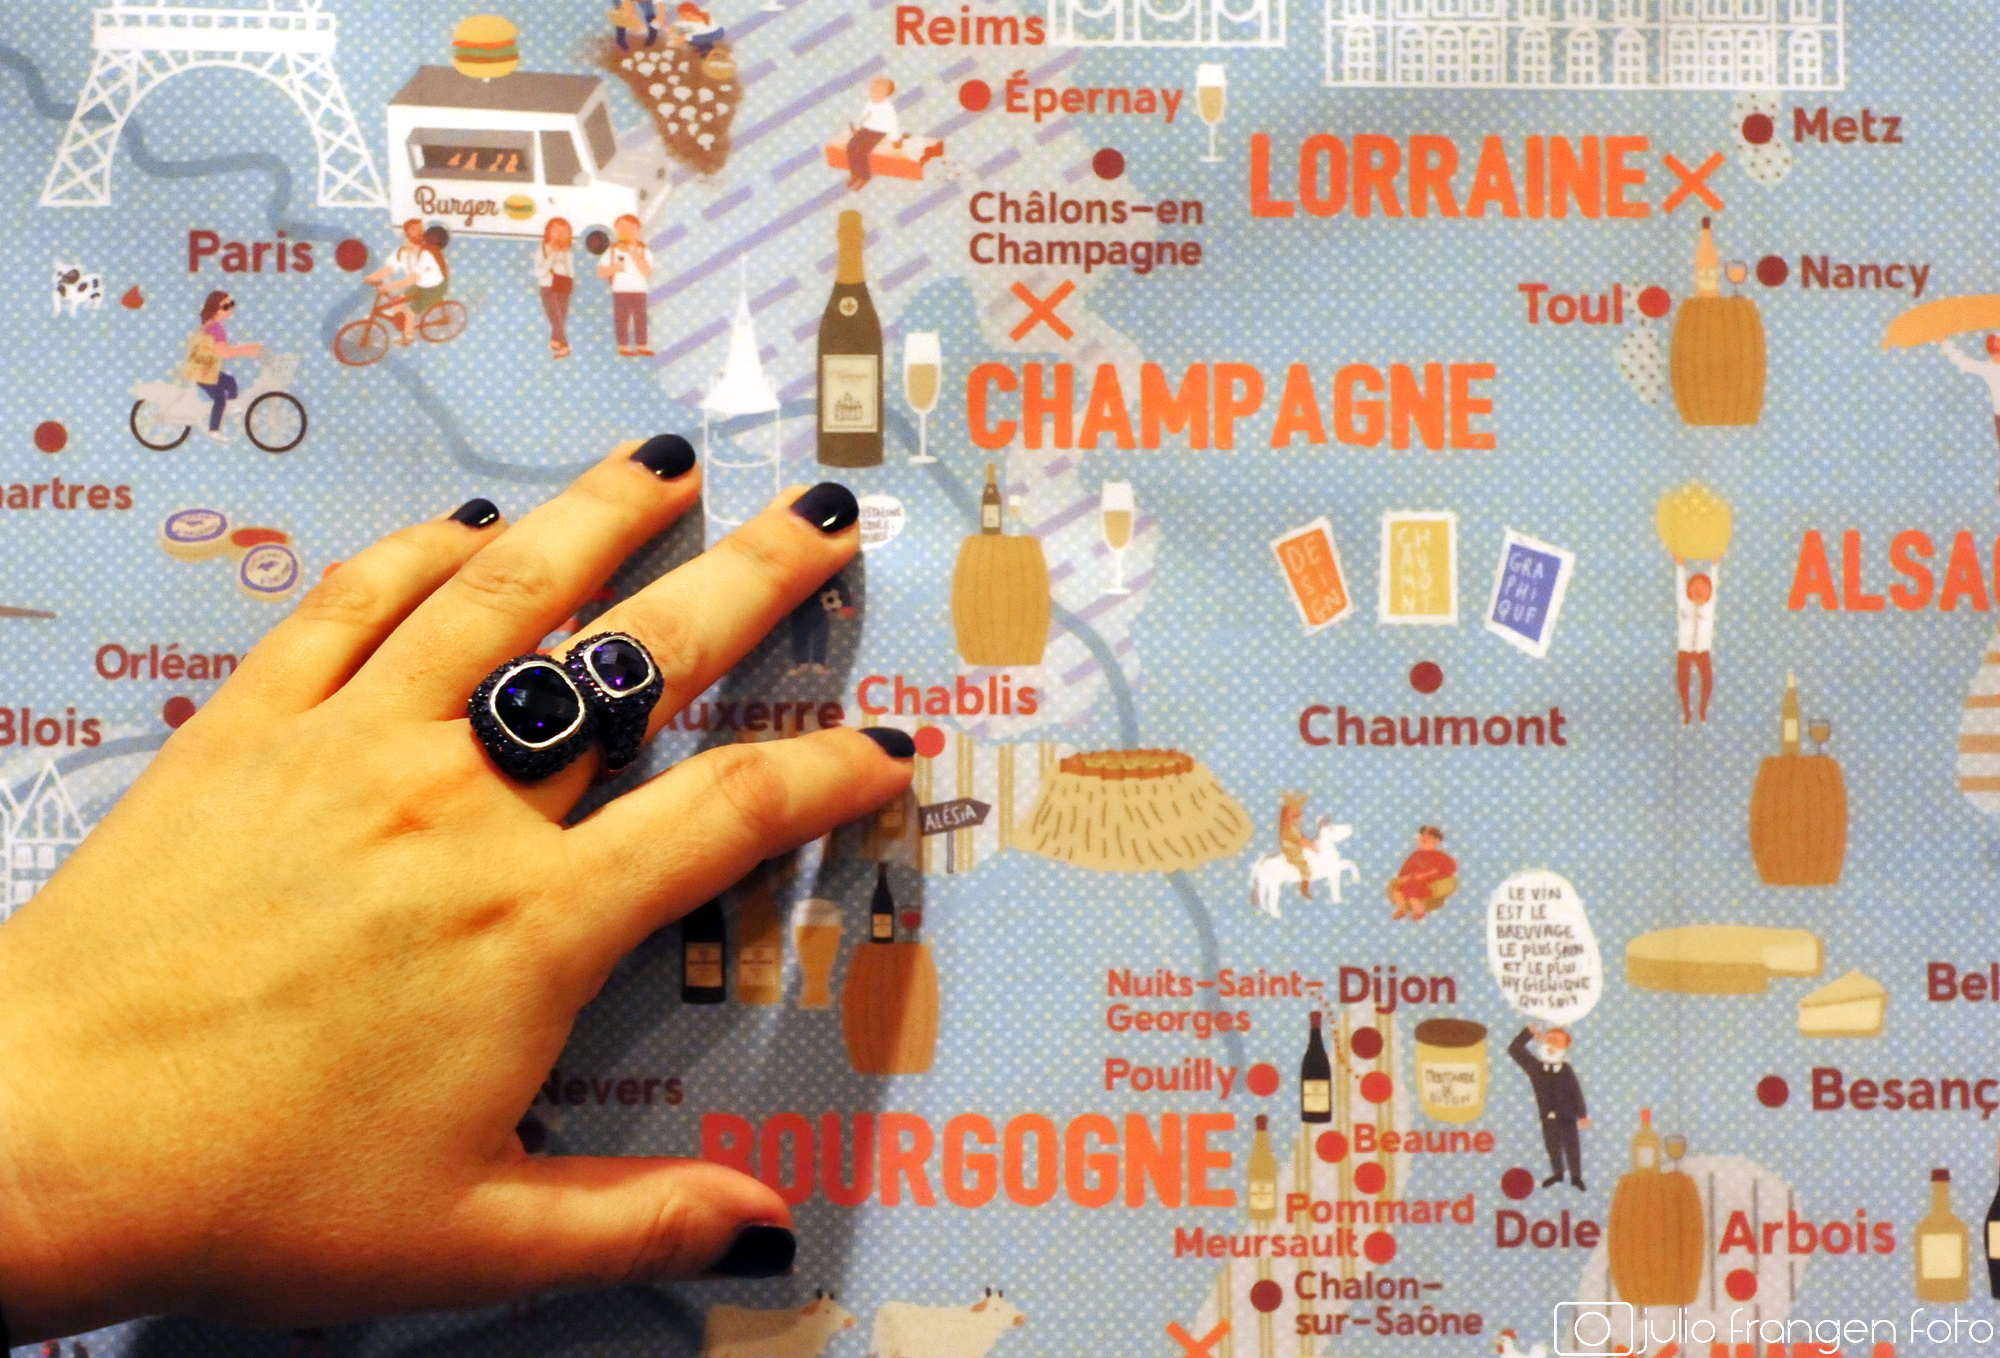 FRANCUSKI I VINO : CHAMPAGNE & CRÉMANT